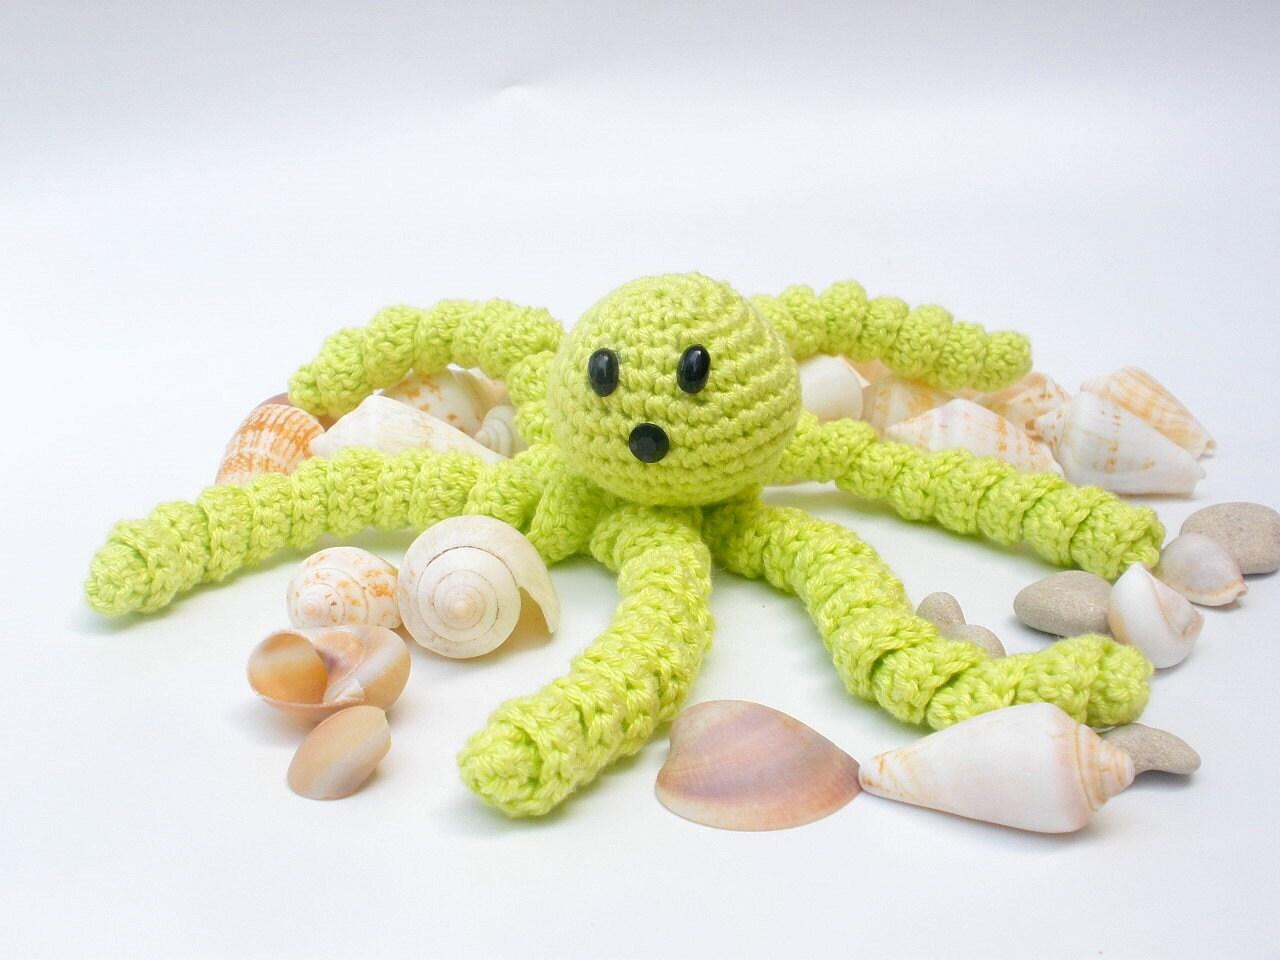 Amigurumi Knit Patterns Easy : Octopus PDF Knitting Pattern Crocheted Octopus Pattern by ...